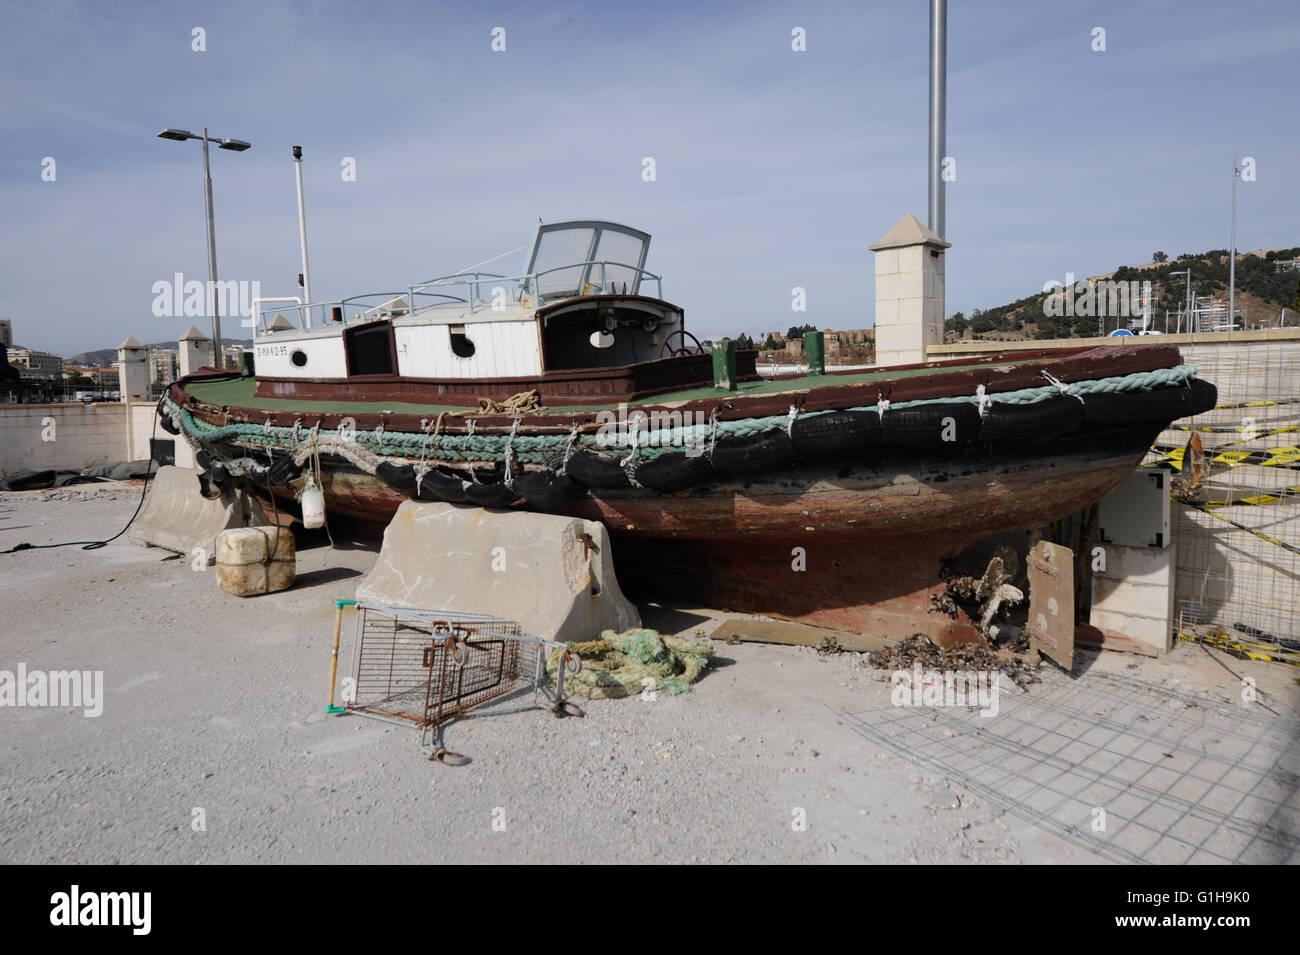 deserted, boat,seashore,harbor, harbour,Malaga - Stock Image